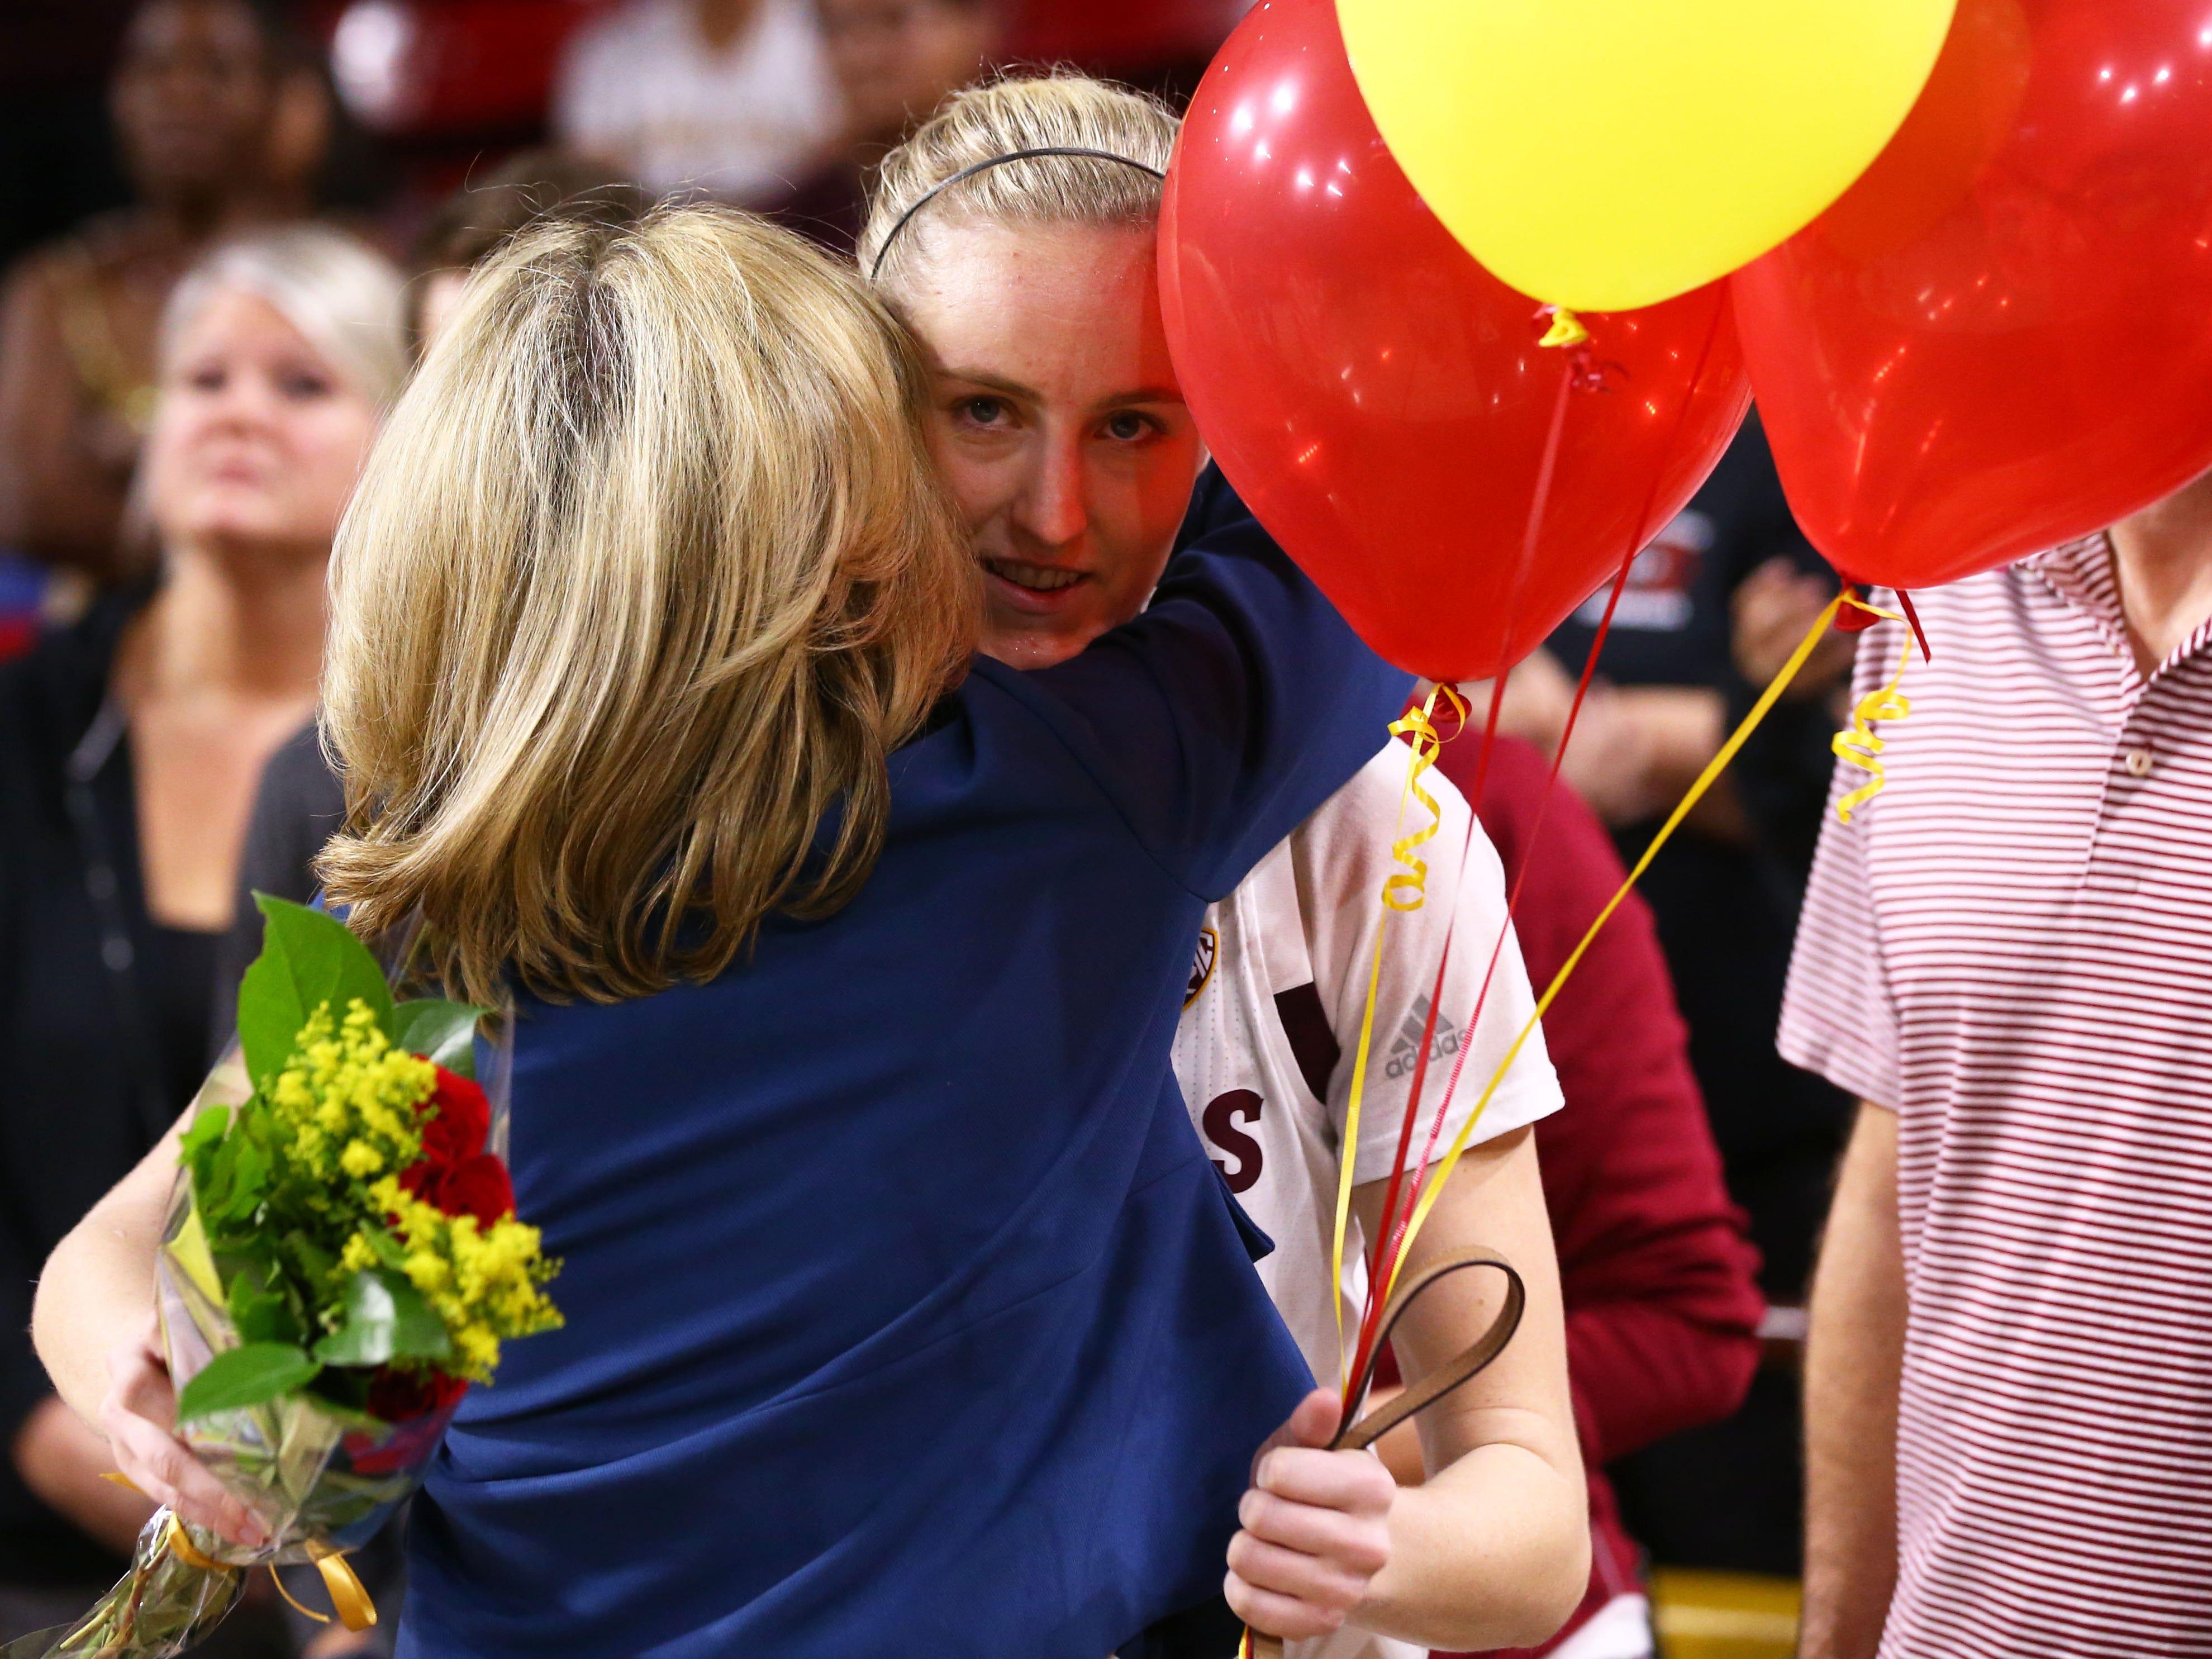 Arizona State Sun Devils guard Courtney Ekmark (22) is hugged by head coach Charli Turner Thorne during senior day ceremonies on Mar. 3, 2019, at Wells Fargo Arena in Tempe, Ariz.